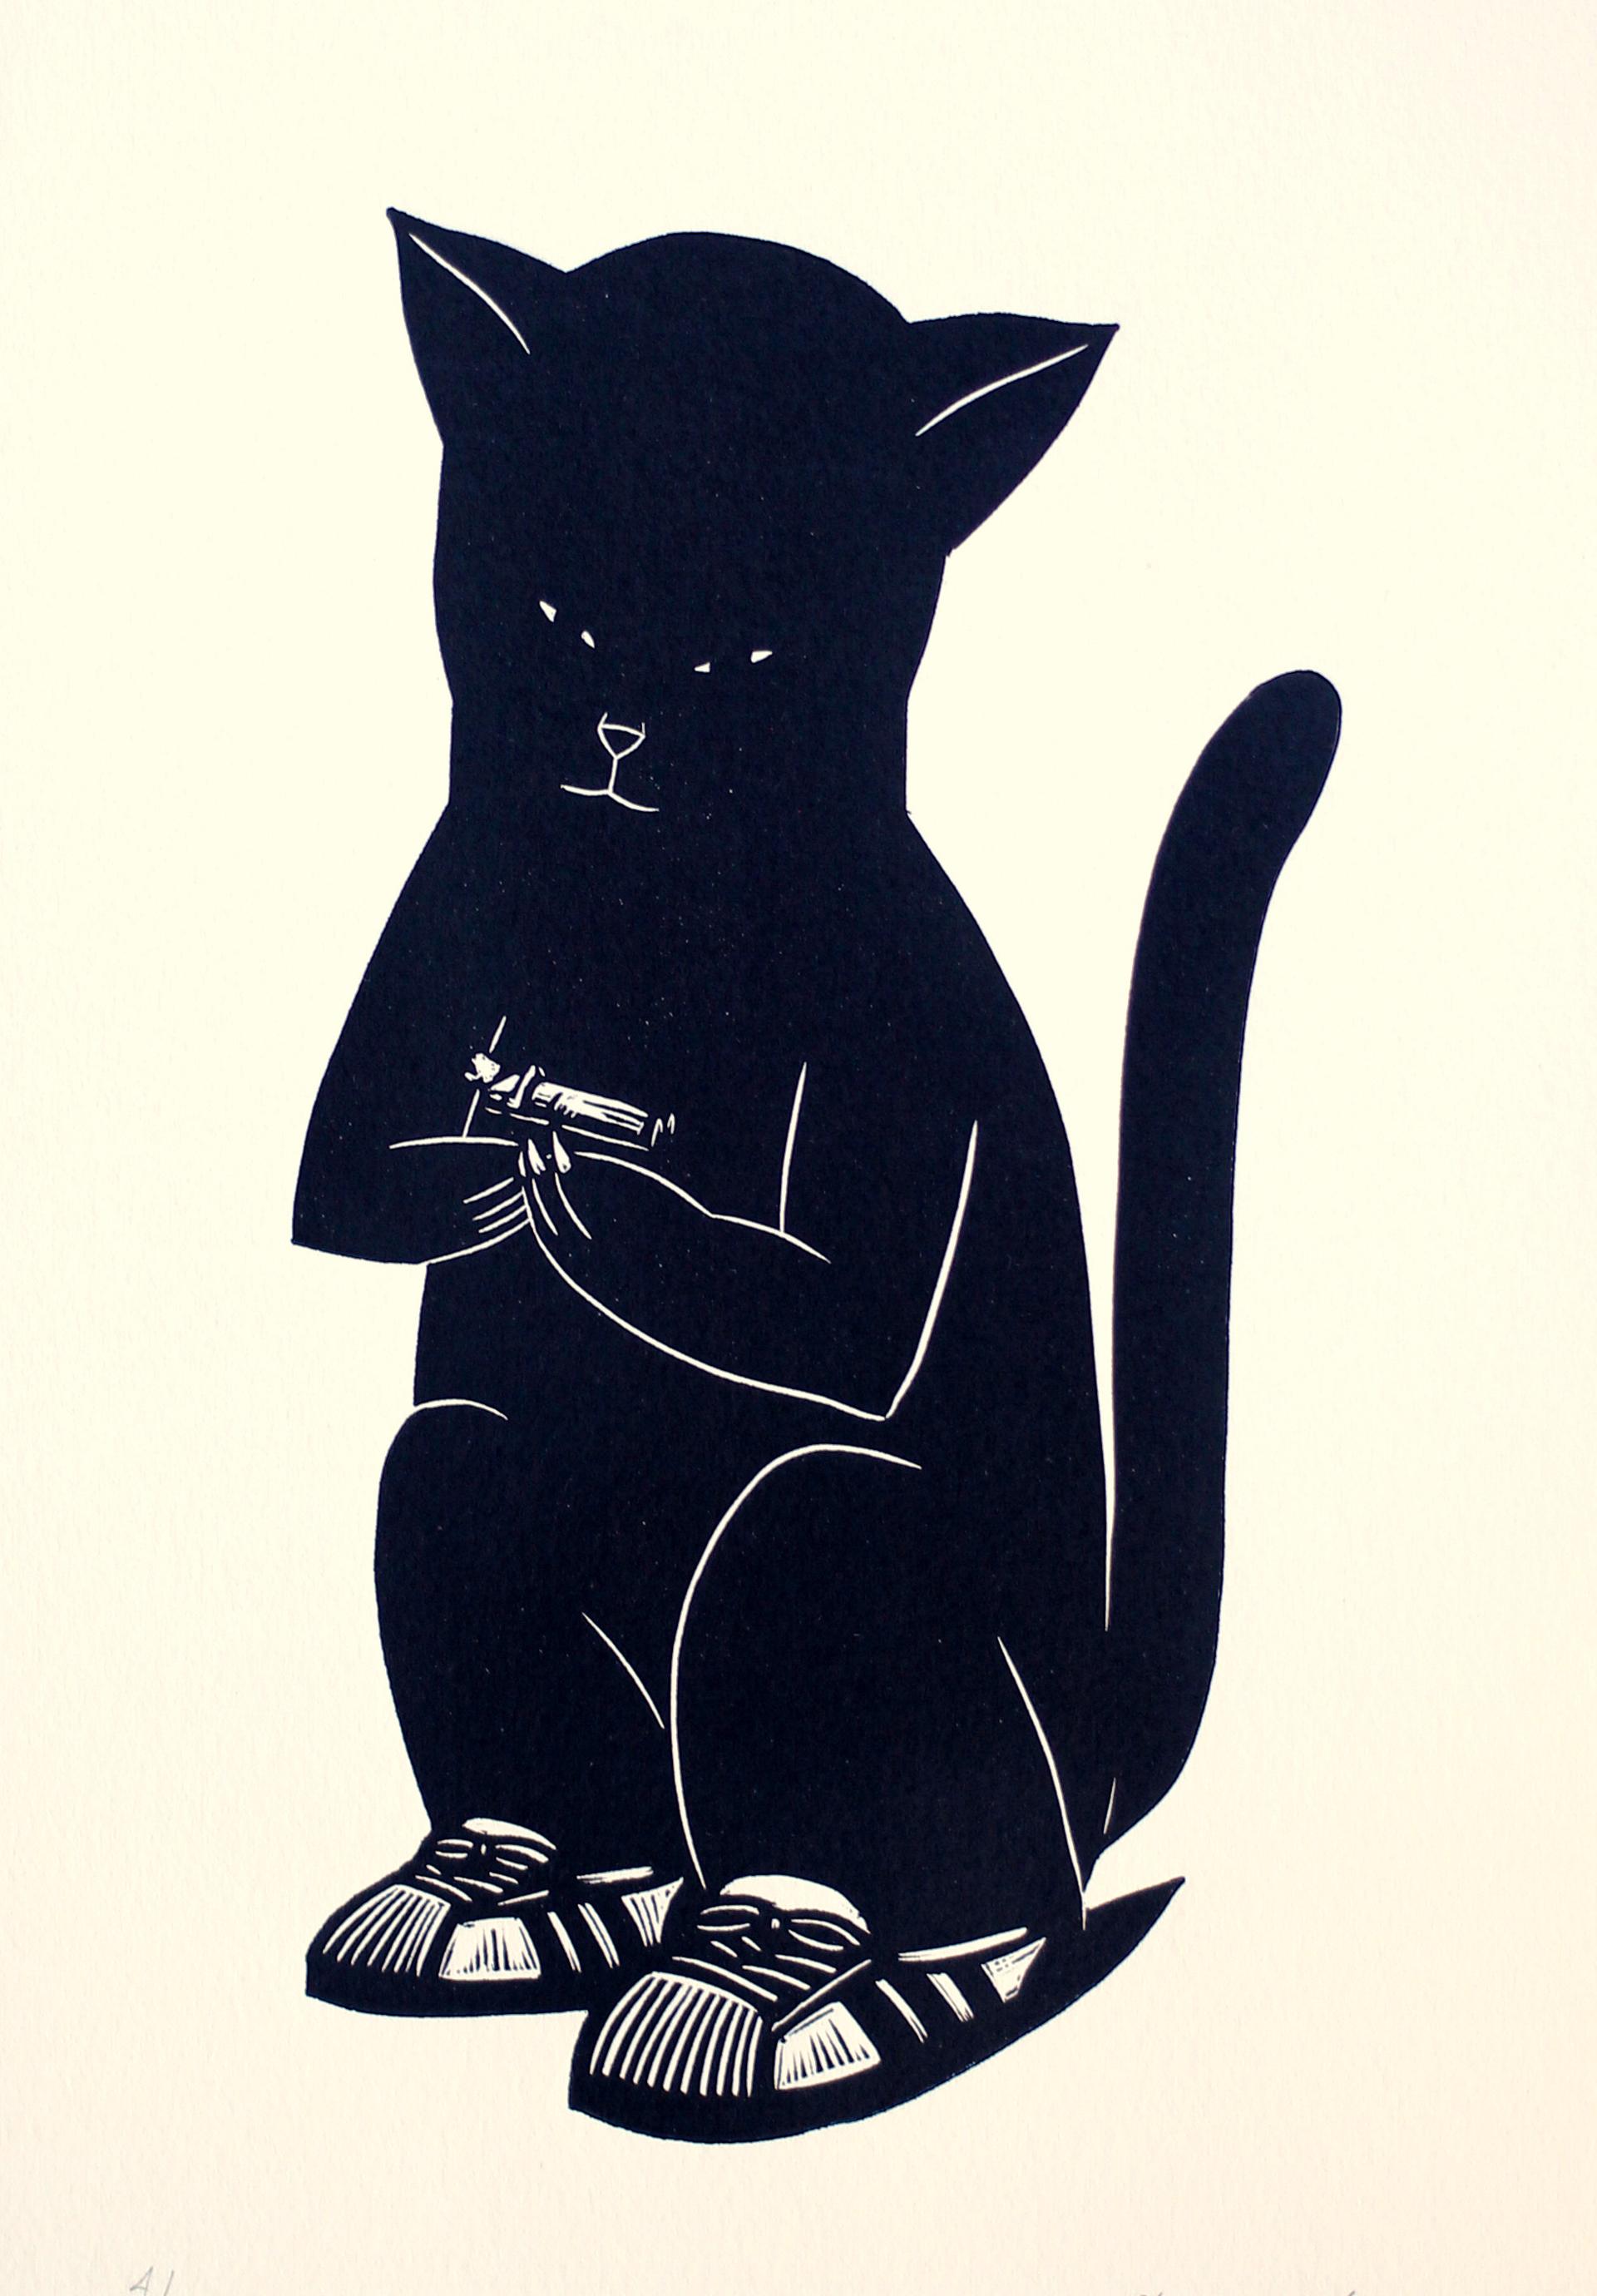 Gato Con Niño by Alberto Cruz